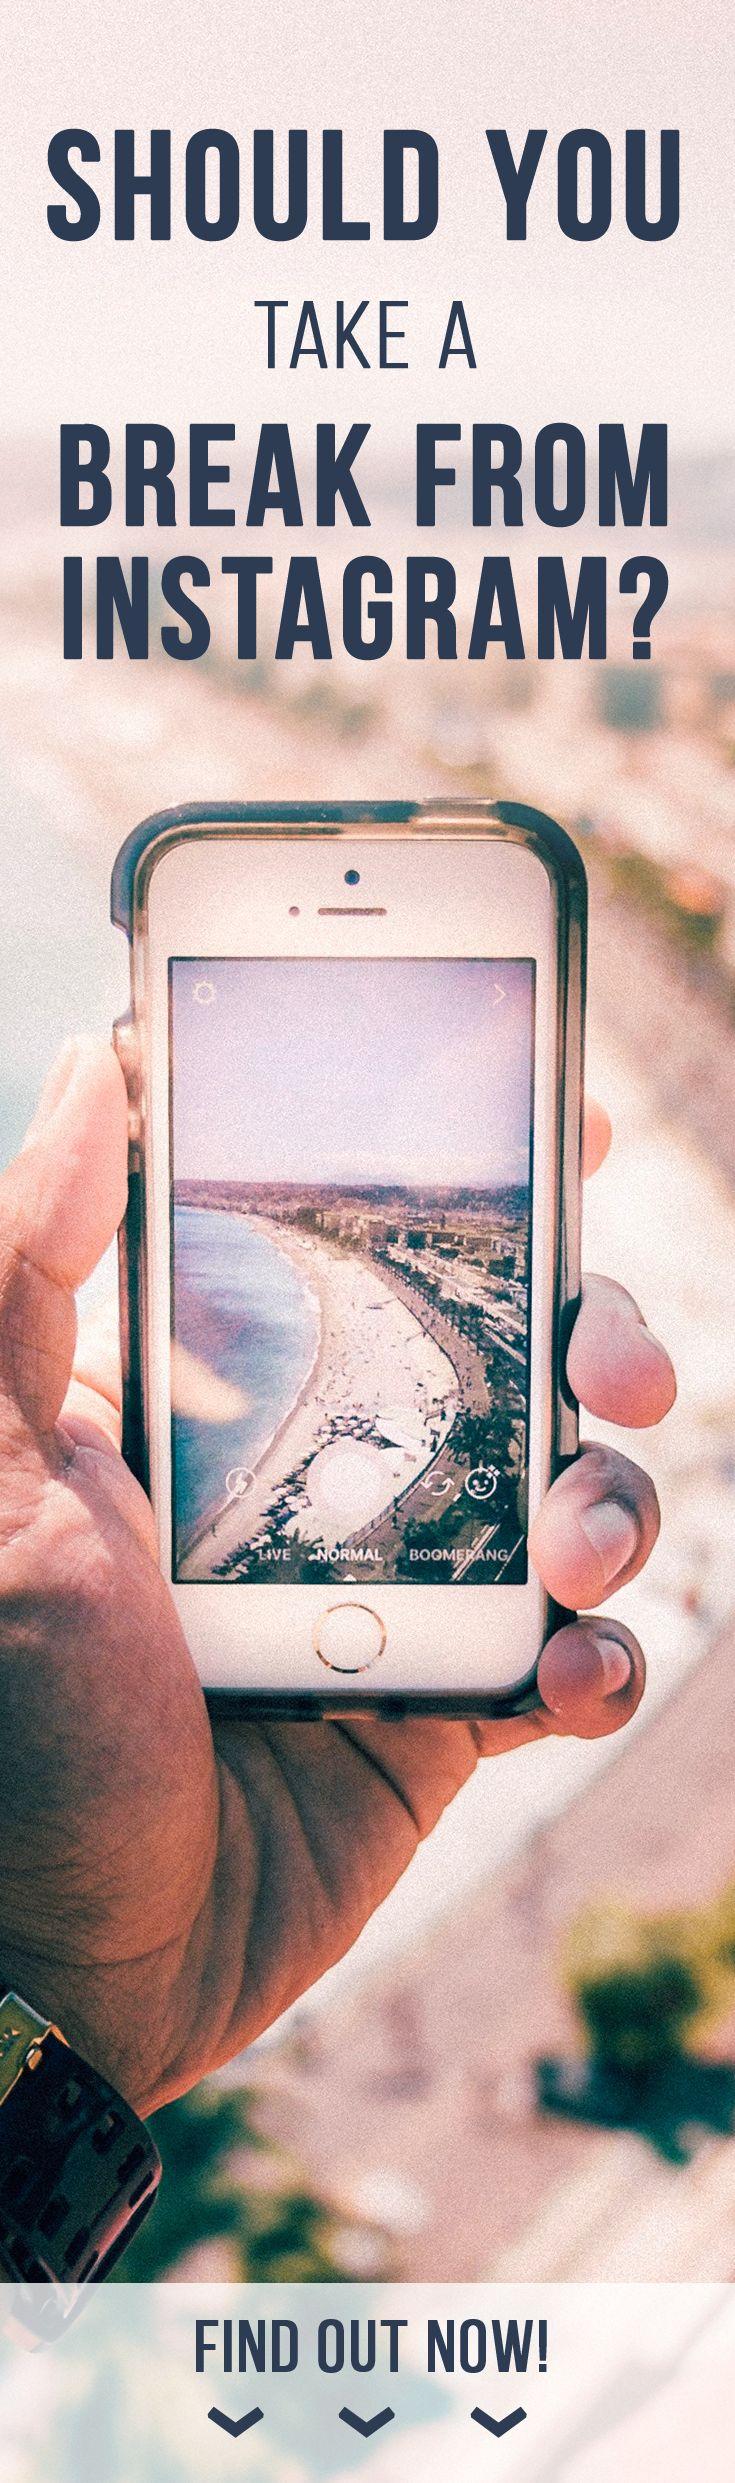 Instagram, Take a break, Social media detox, Pause from social media, Instagram followers. #vibrantsloth #takeastepback #freedom #motivation #choices #justdoit #yes #inspiration #fakestagram #staypositive #behappy #dayoff #metime #improveyourself #improveyourlife